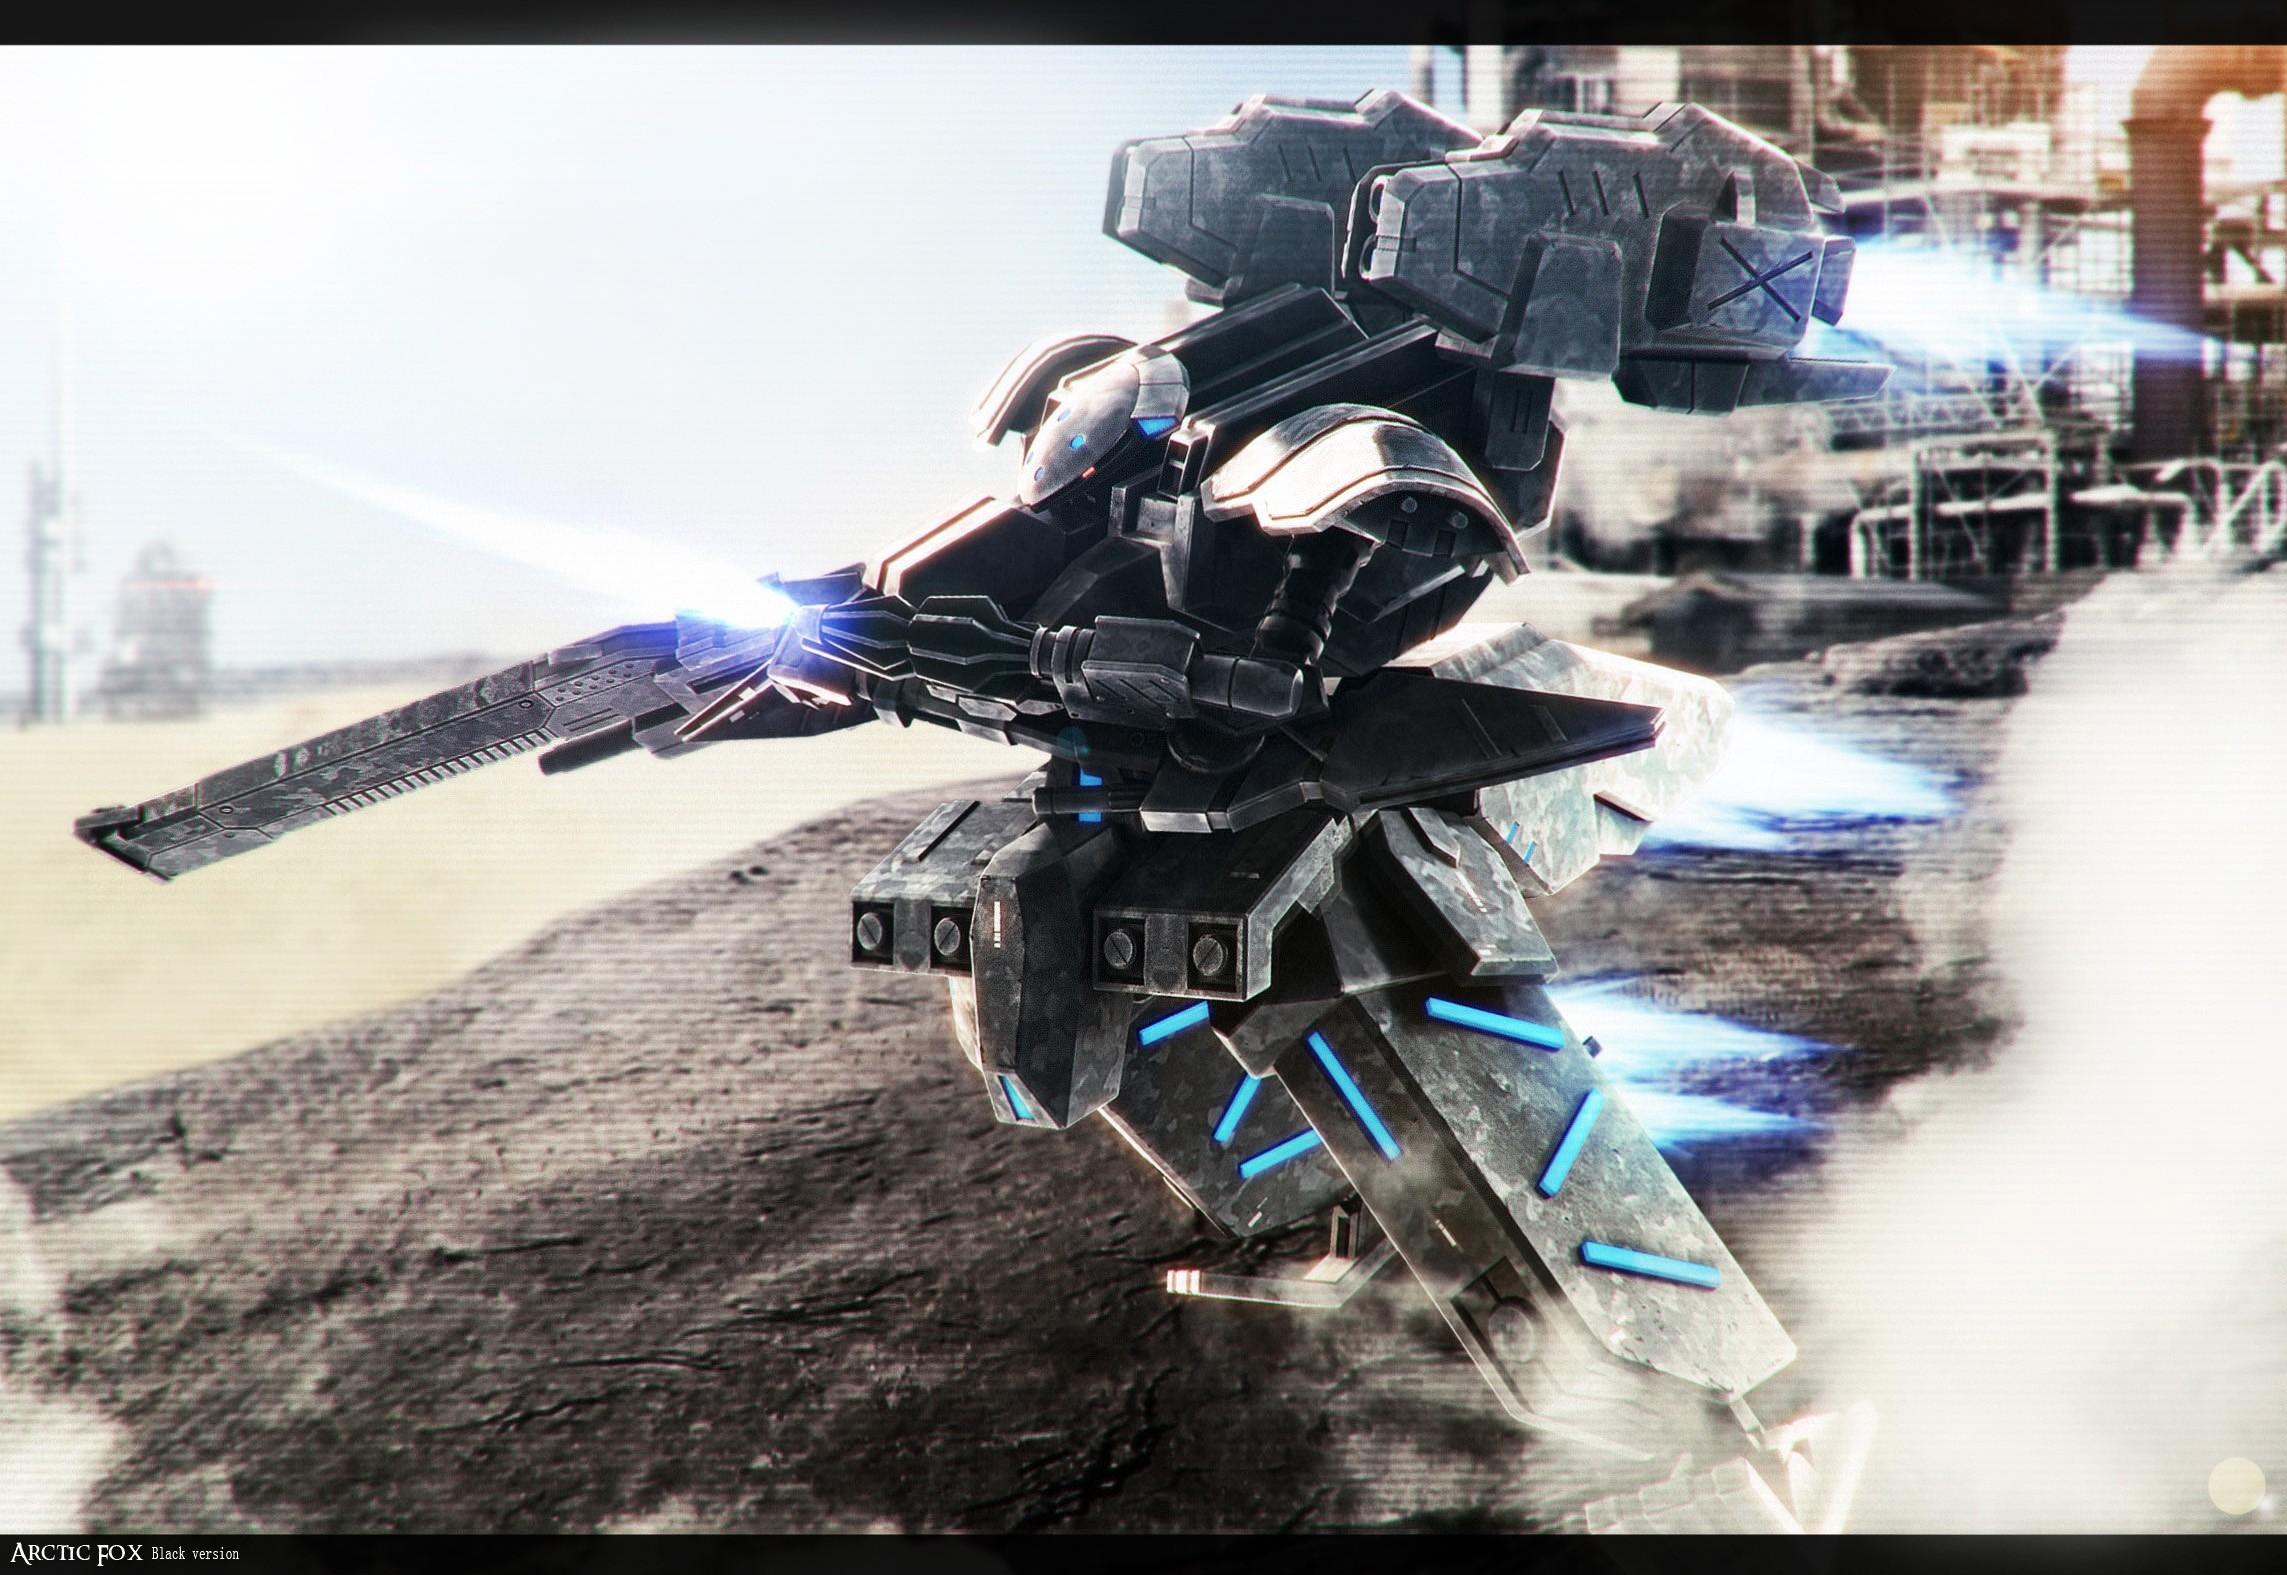 Robots Mecha Wallpaper Robots, Mecha, Armored, Core, Jet .